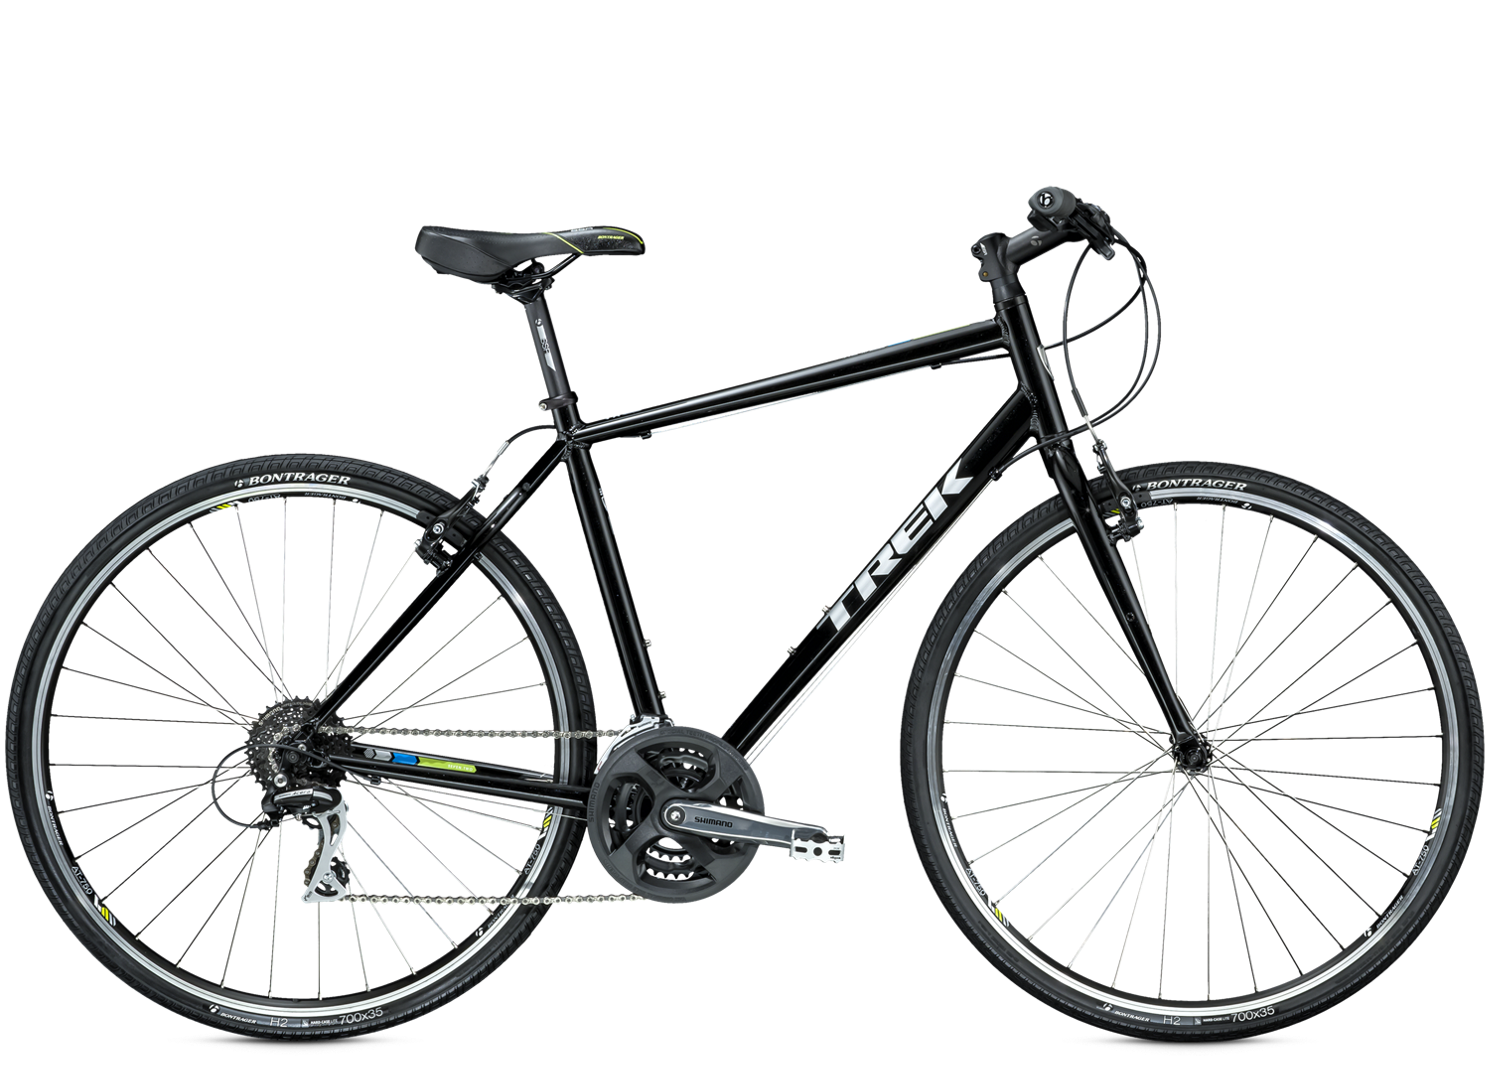 2016 7 2 FX - Bike Archive - Trek Bicycle